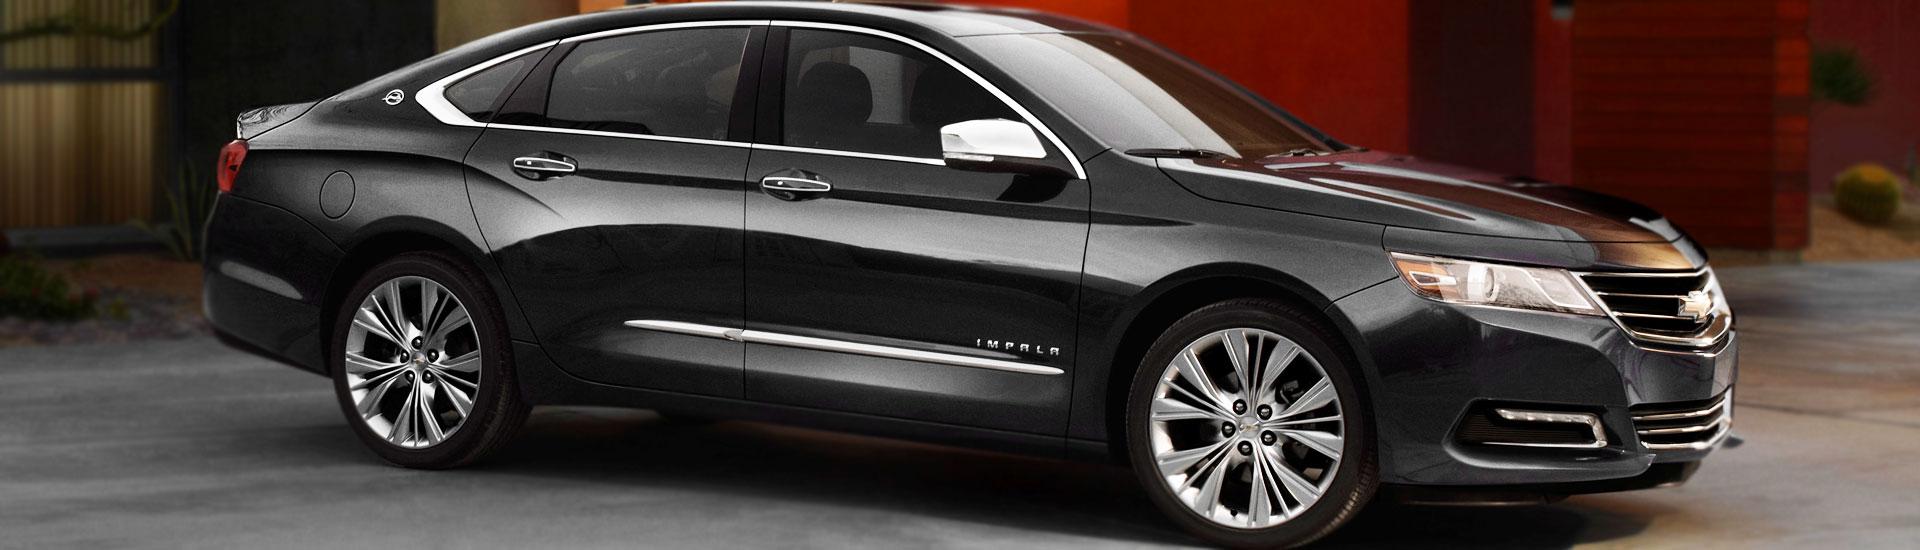 Impala 2009 chevy impala body kit : Chevrolet Impala Window Tint Kit | DIY Precut Chevrolet Impala ...